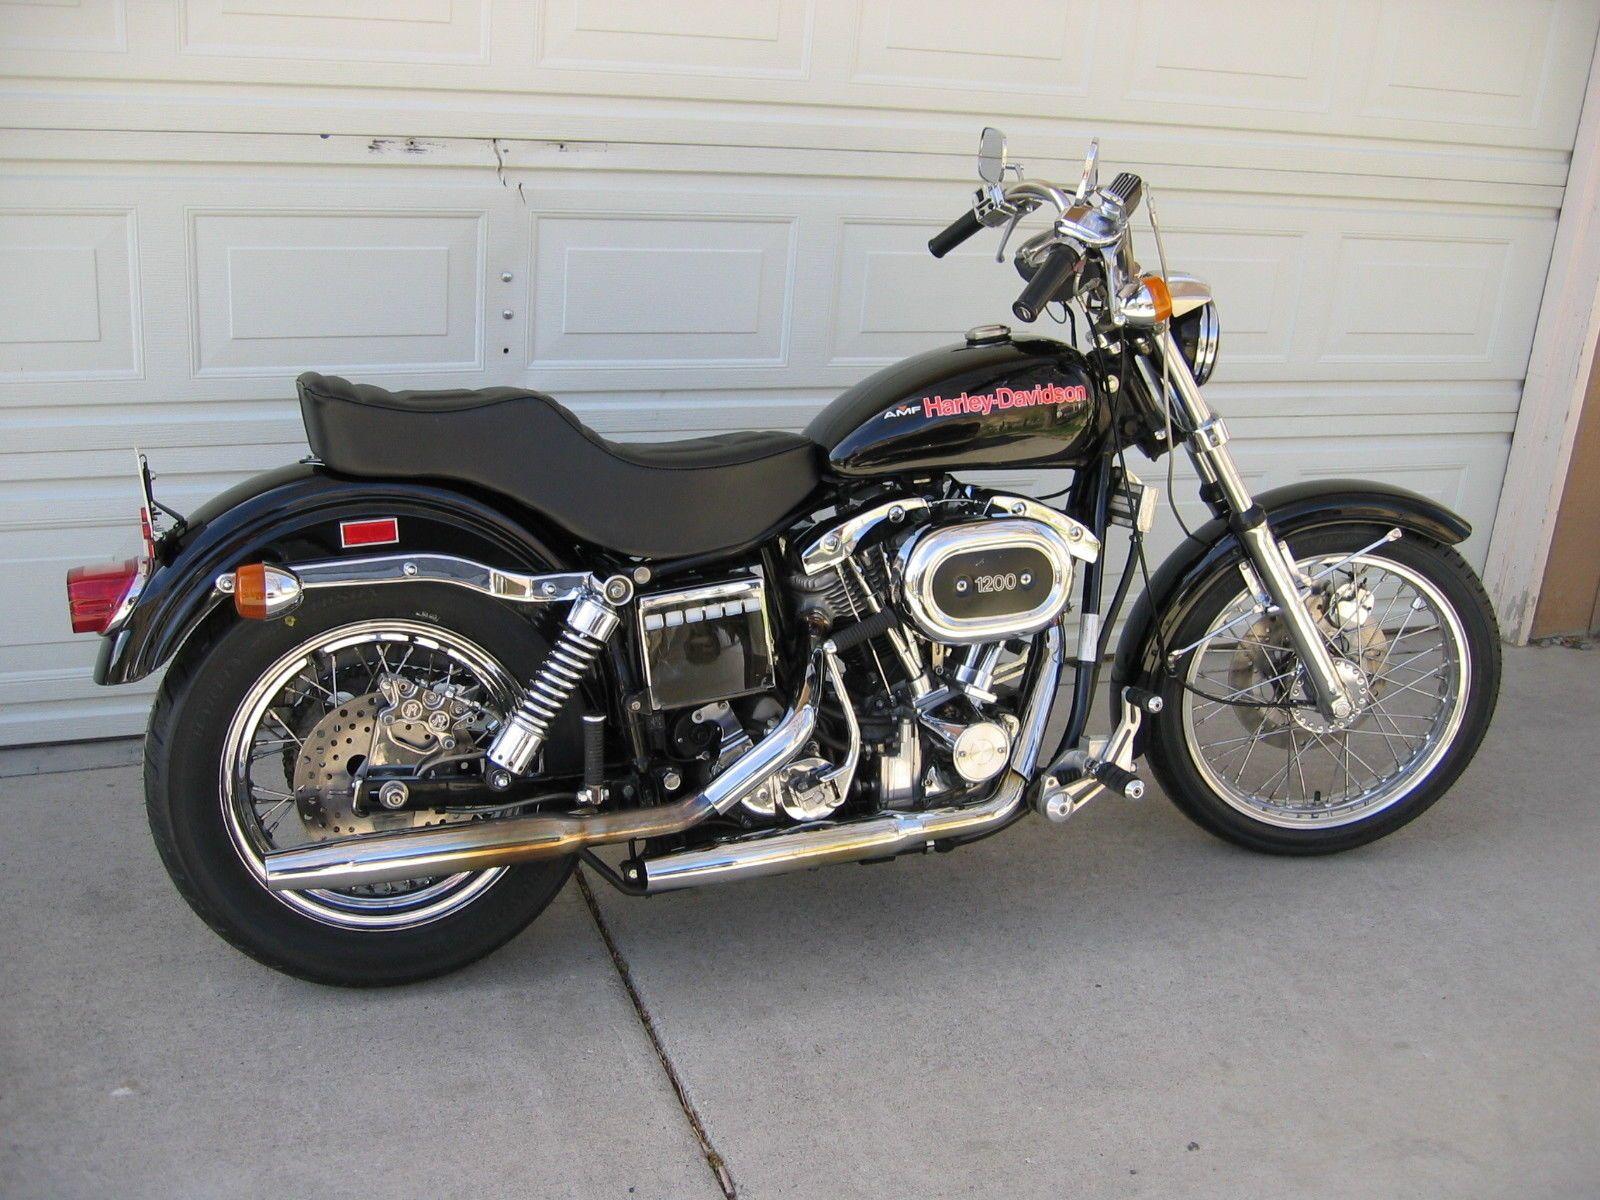 eBay: 1977 Harley-Davidson FXE SUPER GLIDE HARLEY DAVIDSON